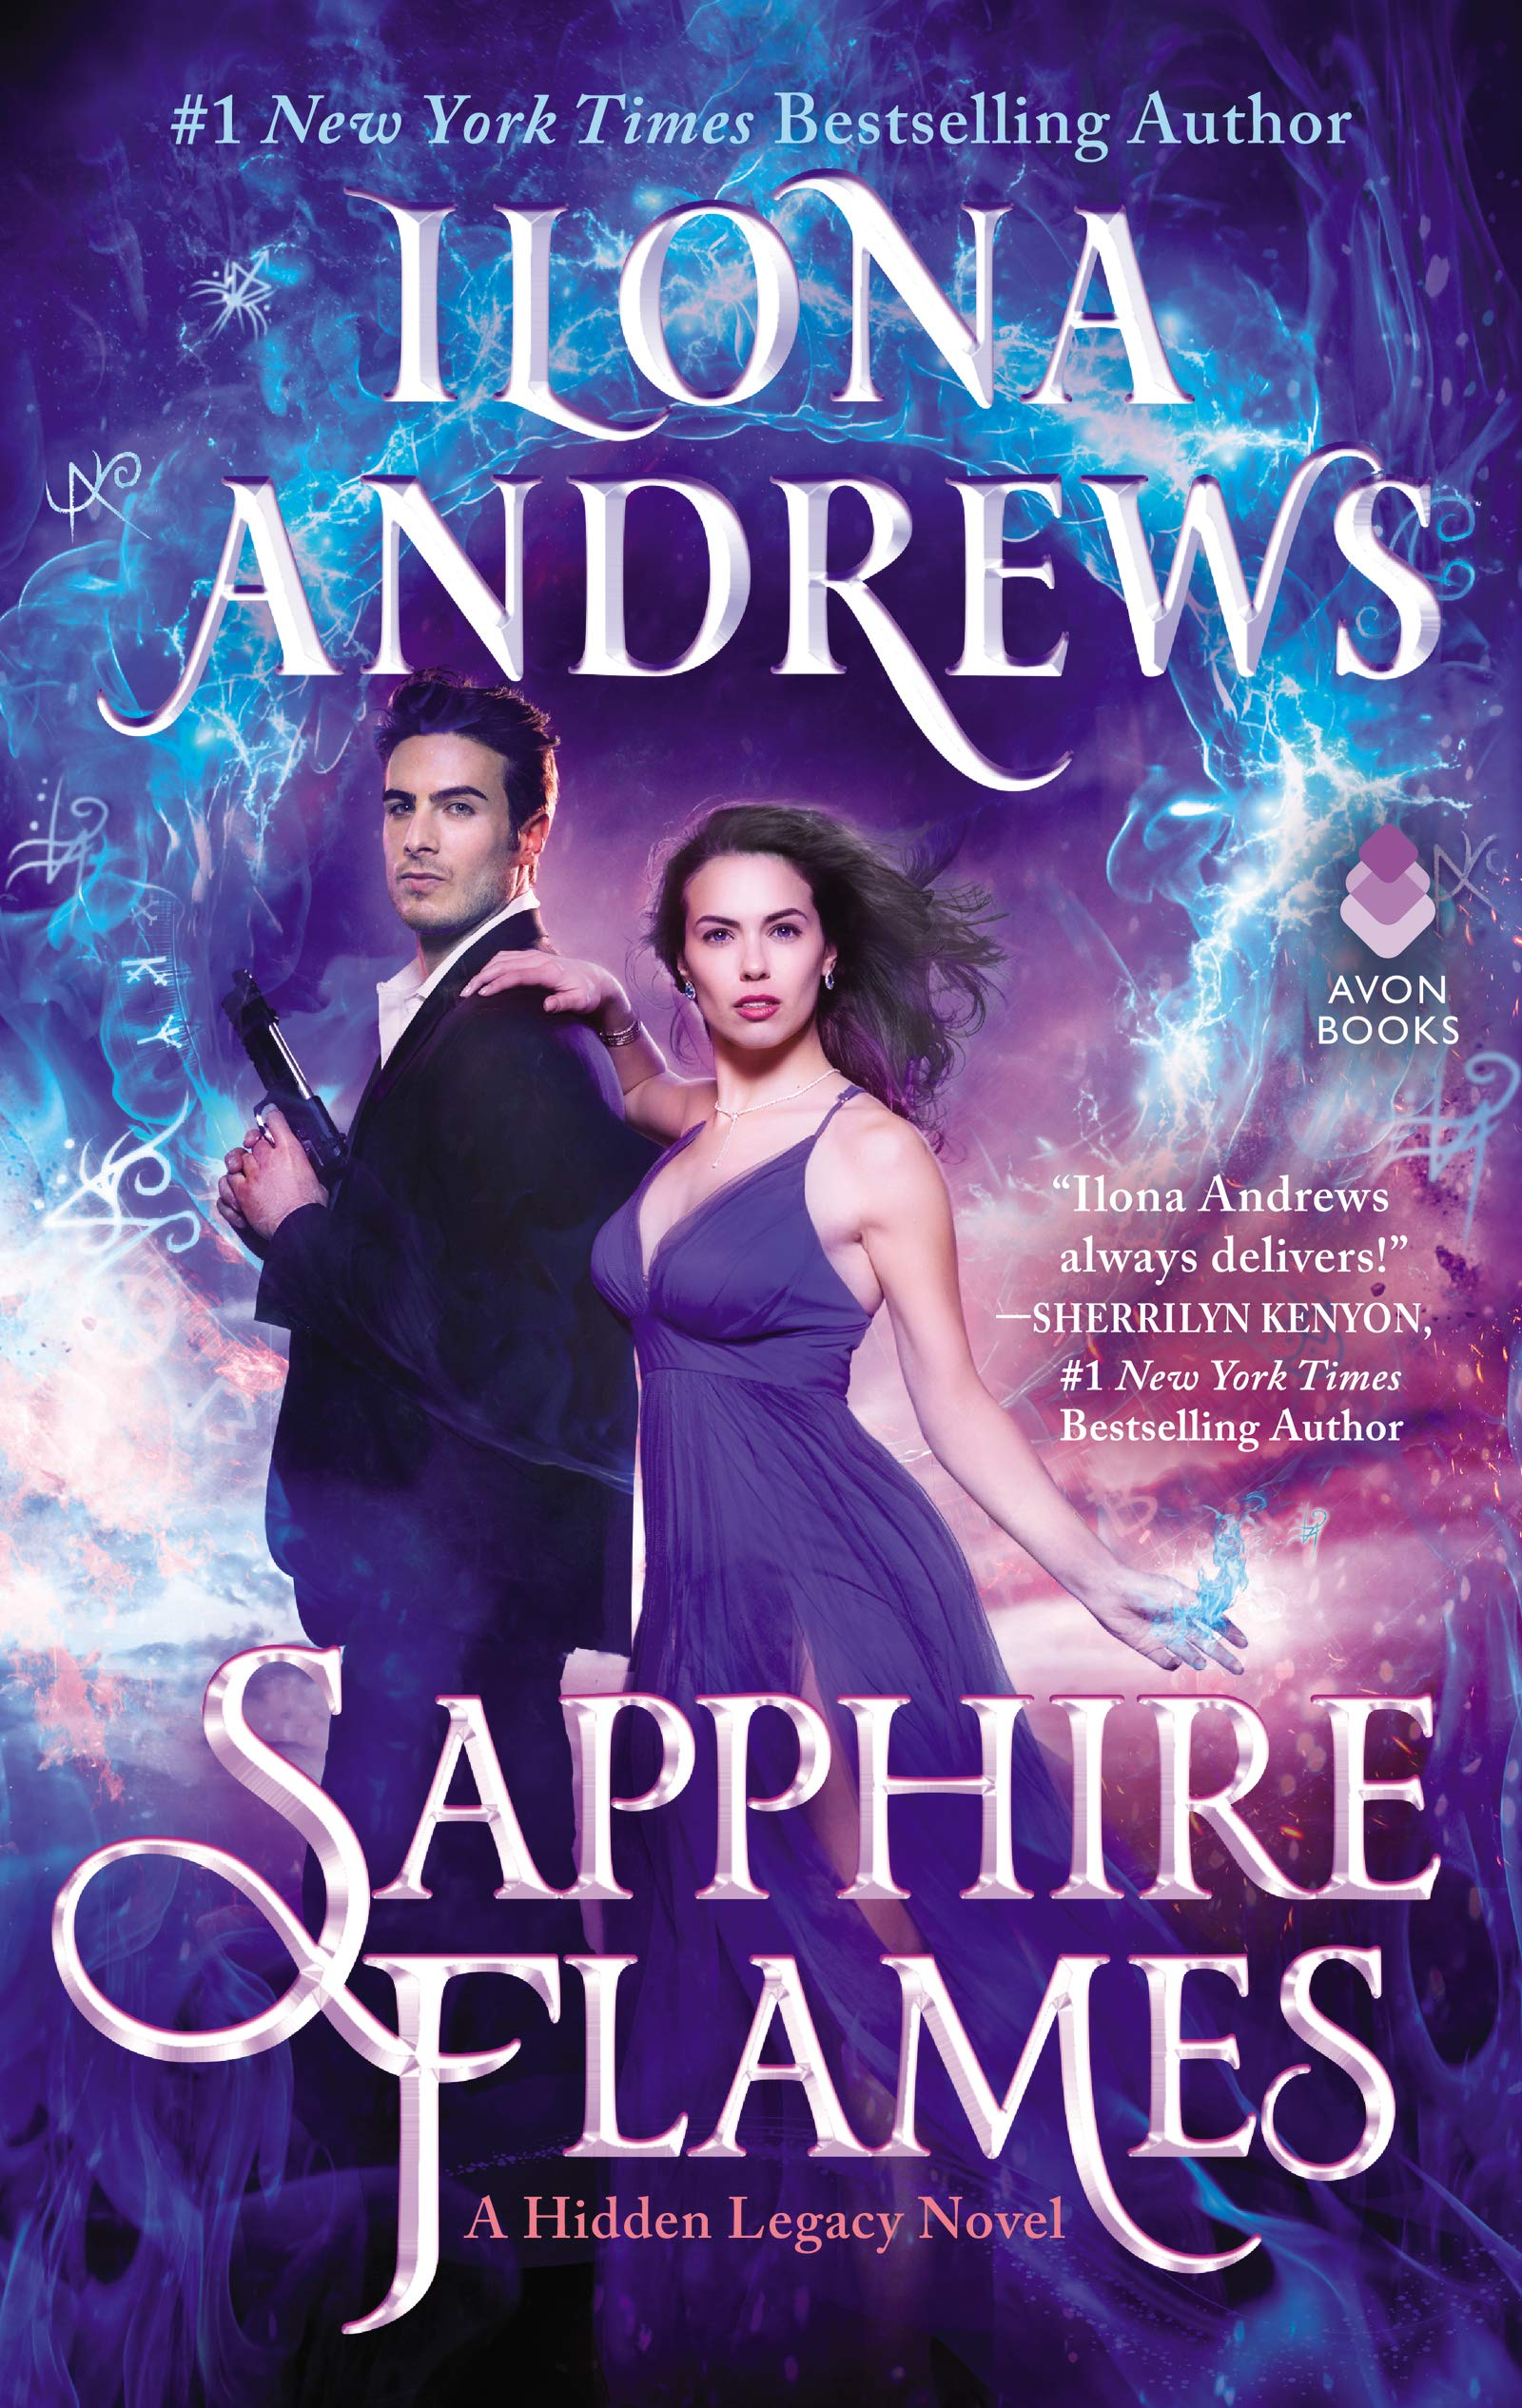 SapphireFlames